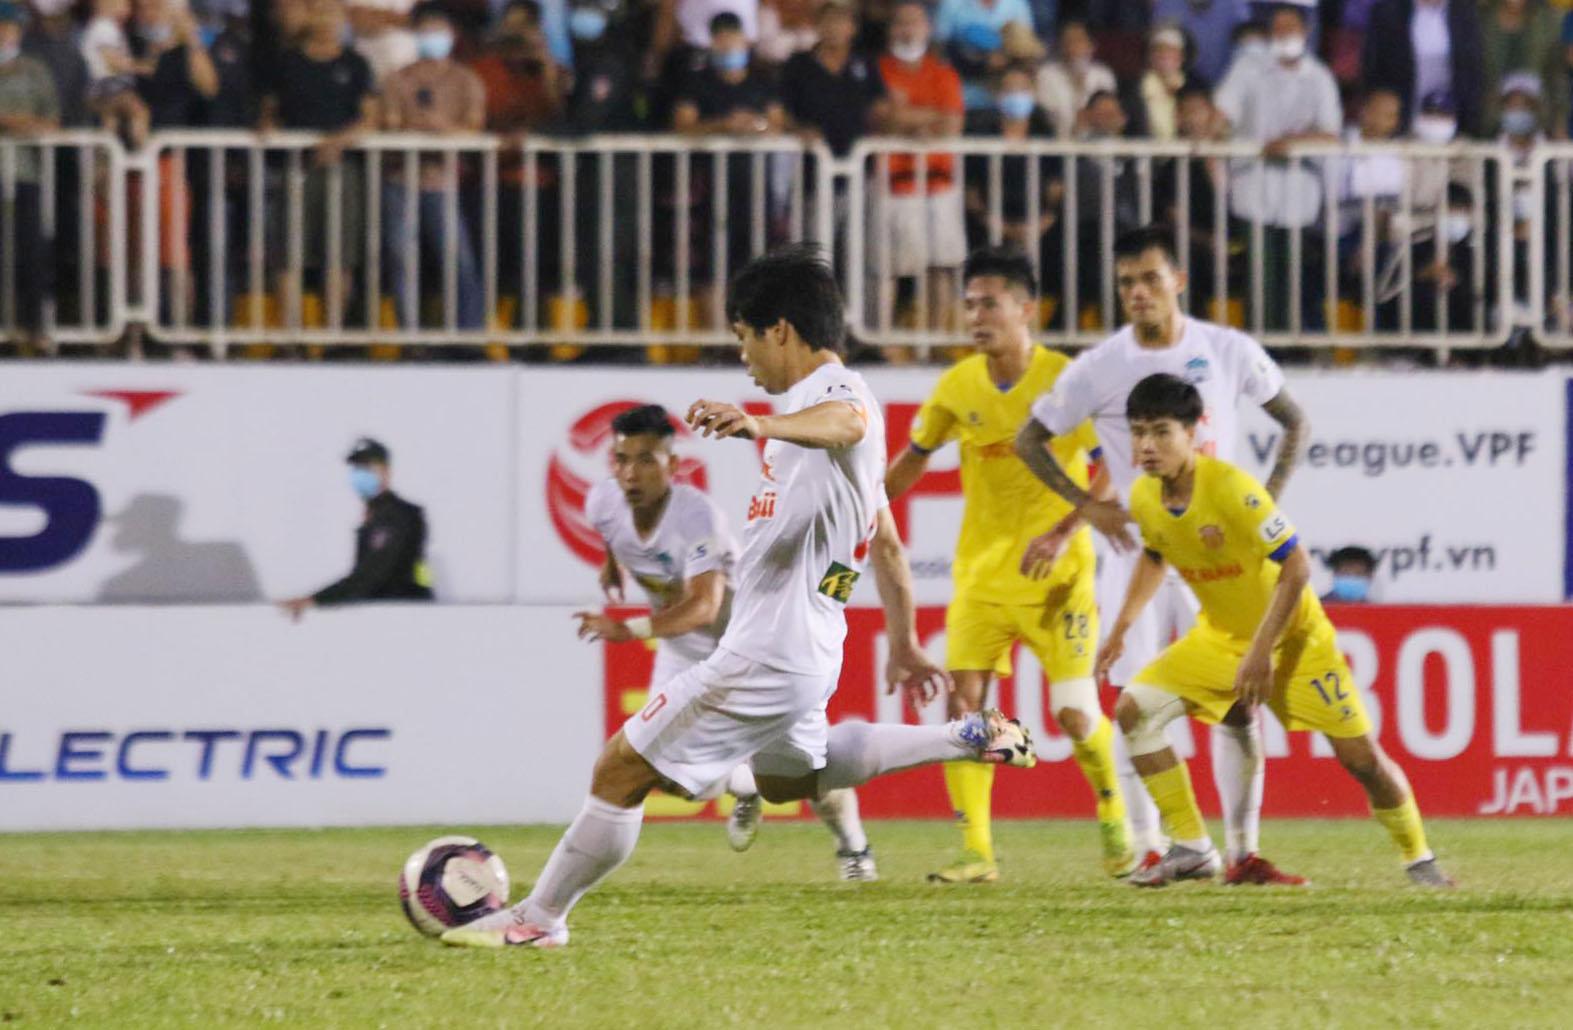 Cong Phuong ยิงจุดโทษได้สำเร็จในนาทีที่ 90 + 5 ส่งผลให้ HAGL ชนะ 4-3 อย่างน่าทึ่ง  ภาพ: Dong Huyen